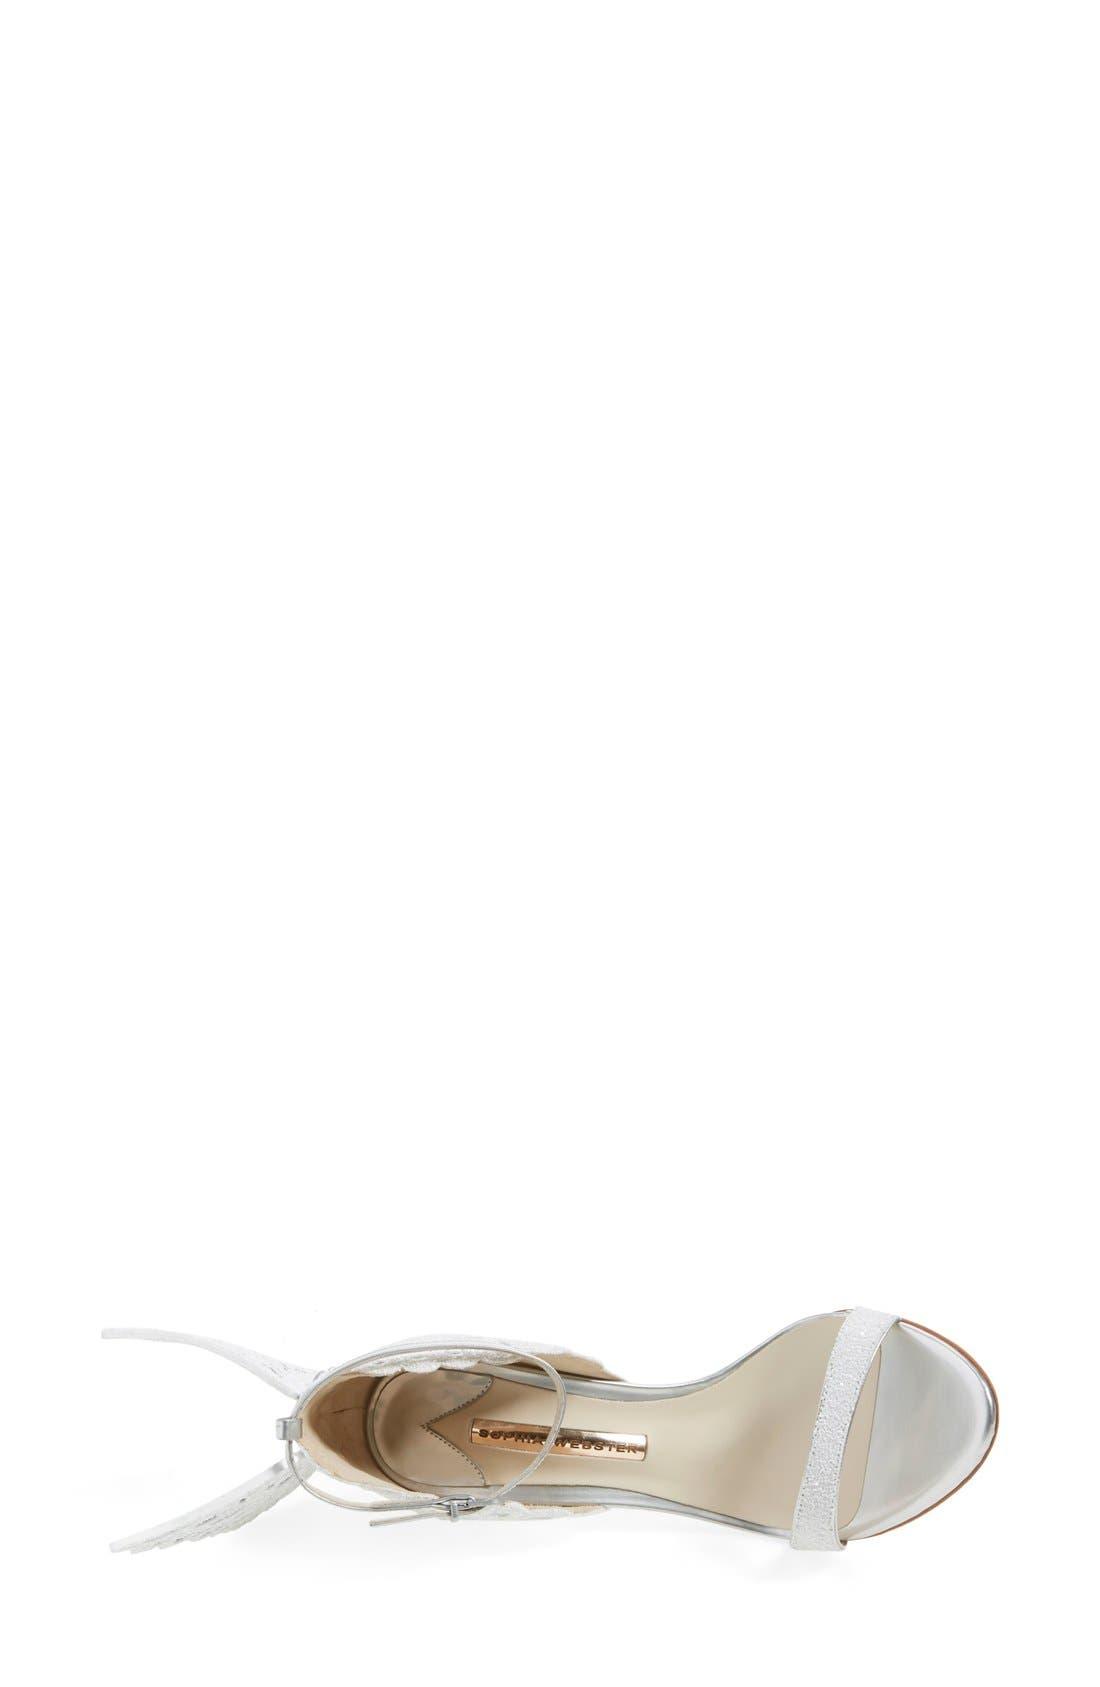 Alternate Image 3  - Sophia Webster 'Evangeline' Ankle Strap Sandal (Women)